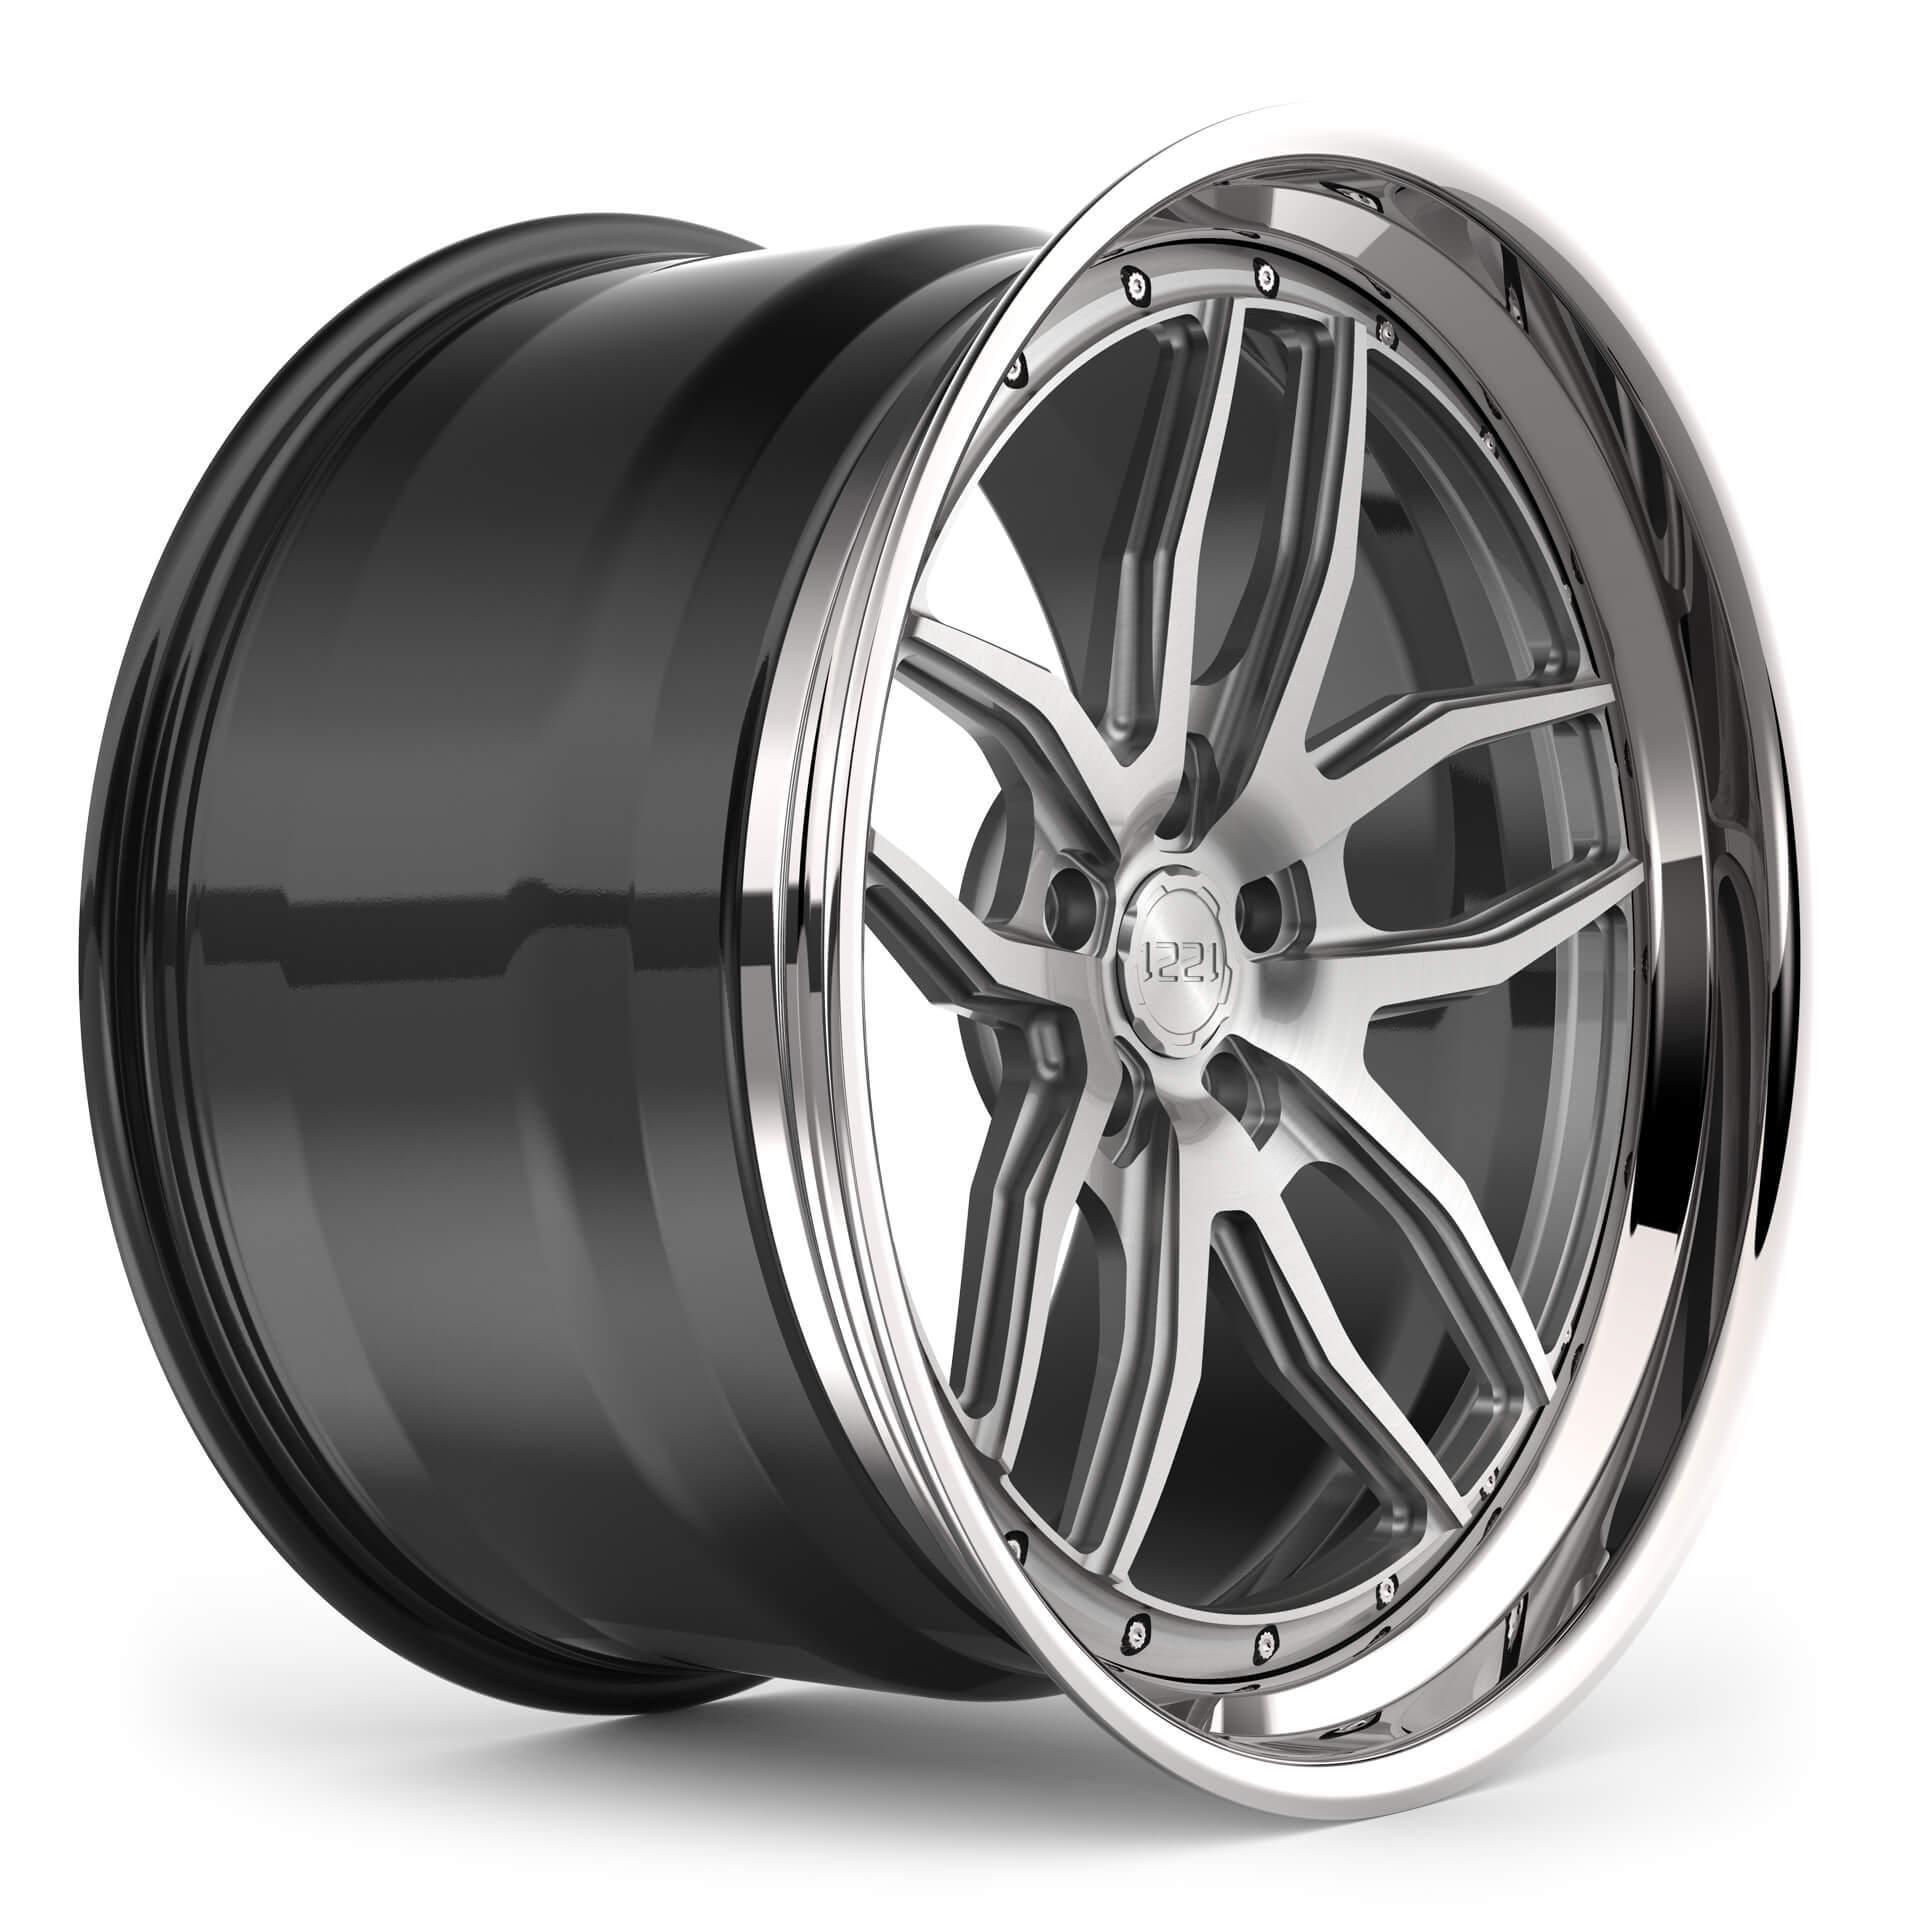 1221 Wheels  0770 AP3 SPORT3.0 forged wheels